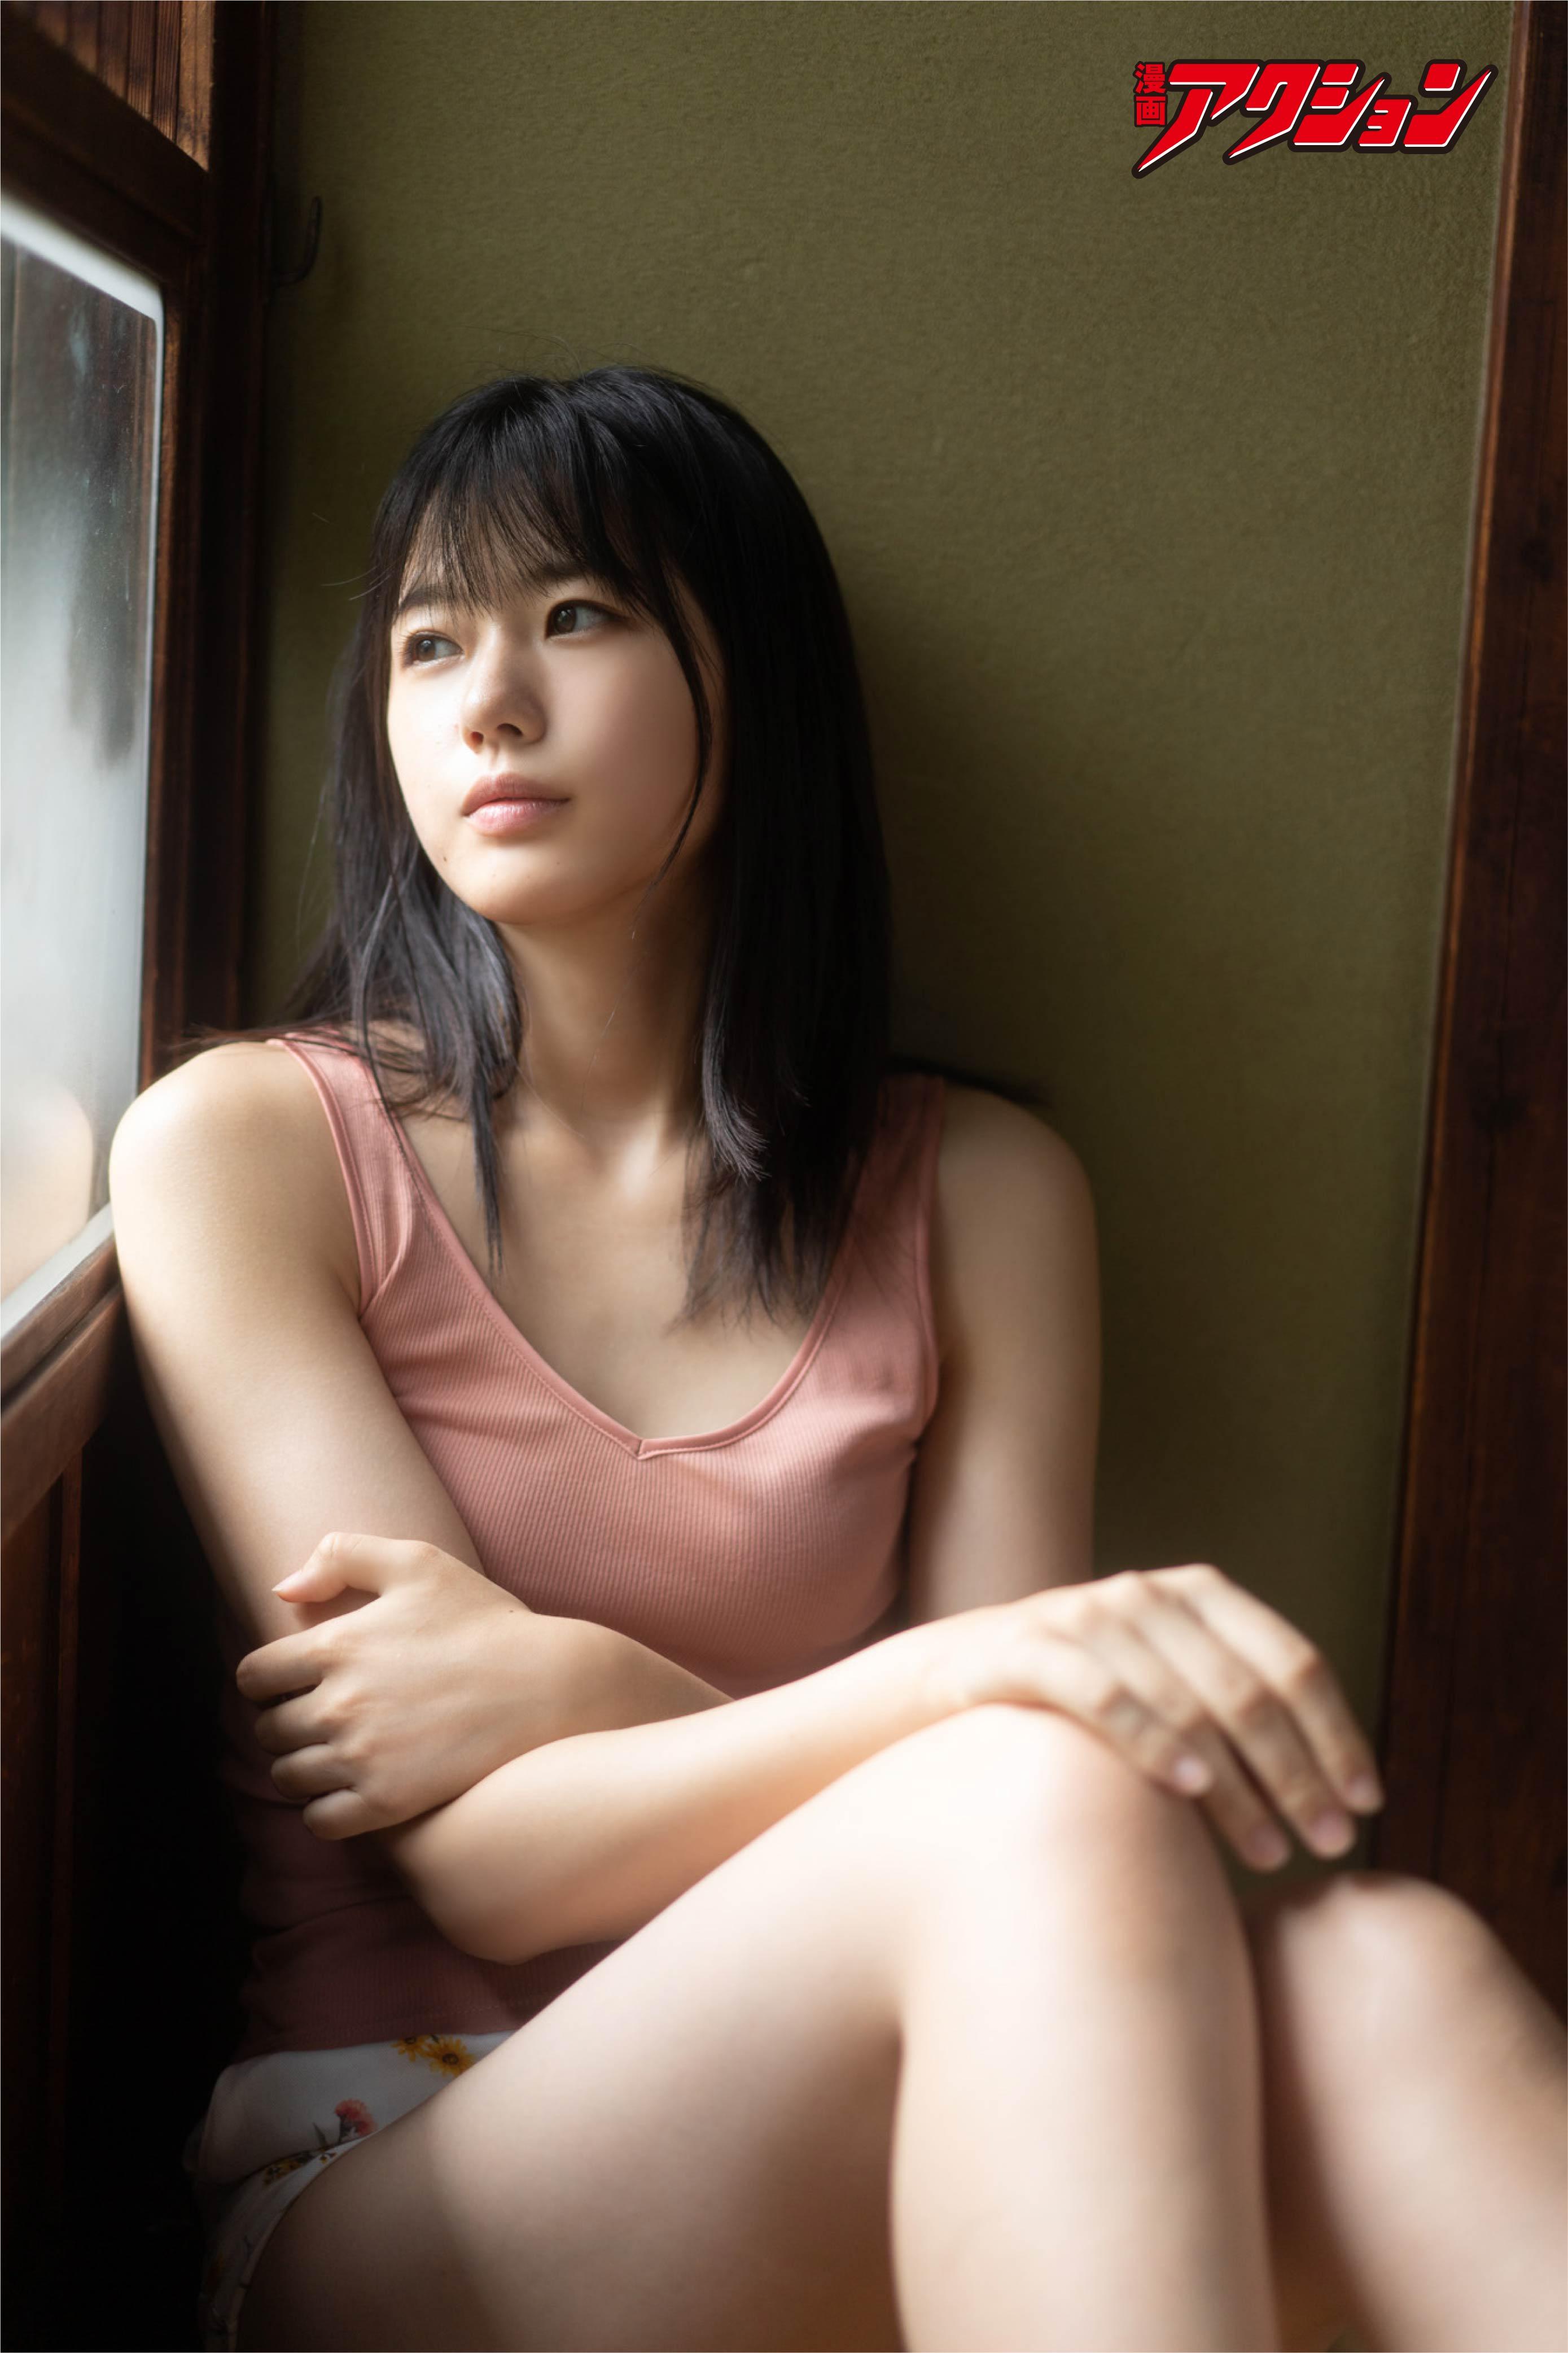 STU48瀧野由美子が『漫画アクション』の表紙巻頭グラビアに登場!【写真7枚】の画像001